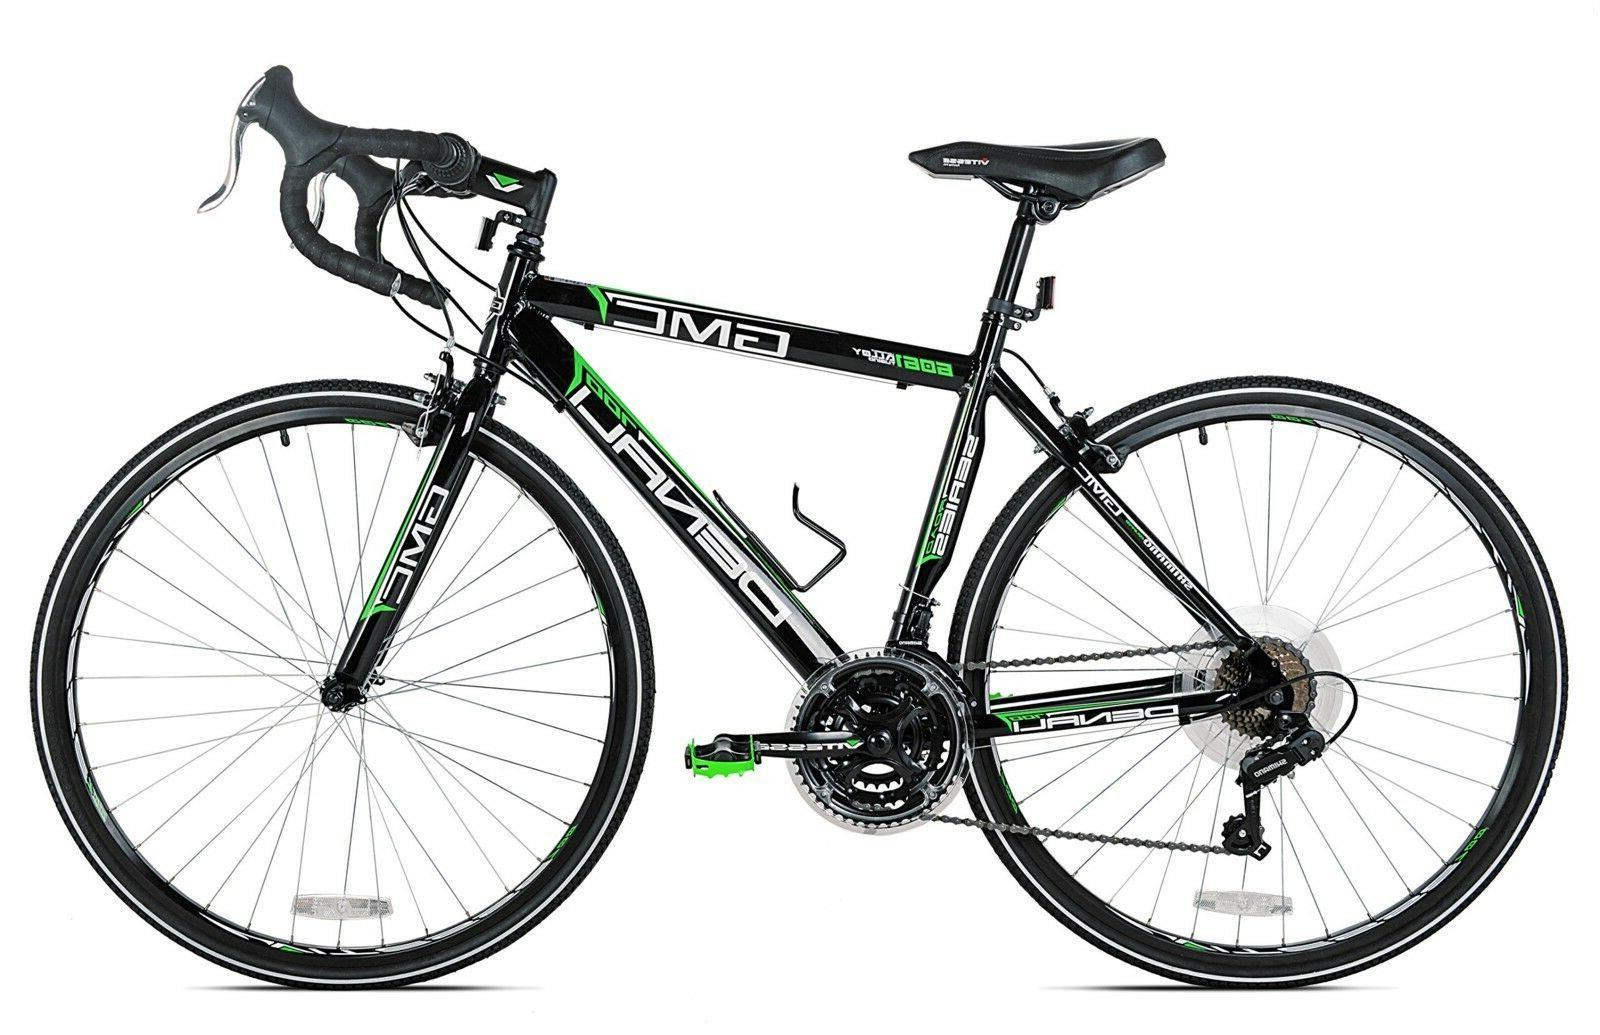 GMC Denali Road Bike, Black/Green, 20-Inch/Small, Performance Tire